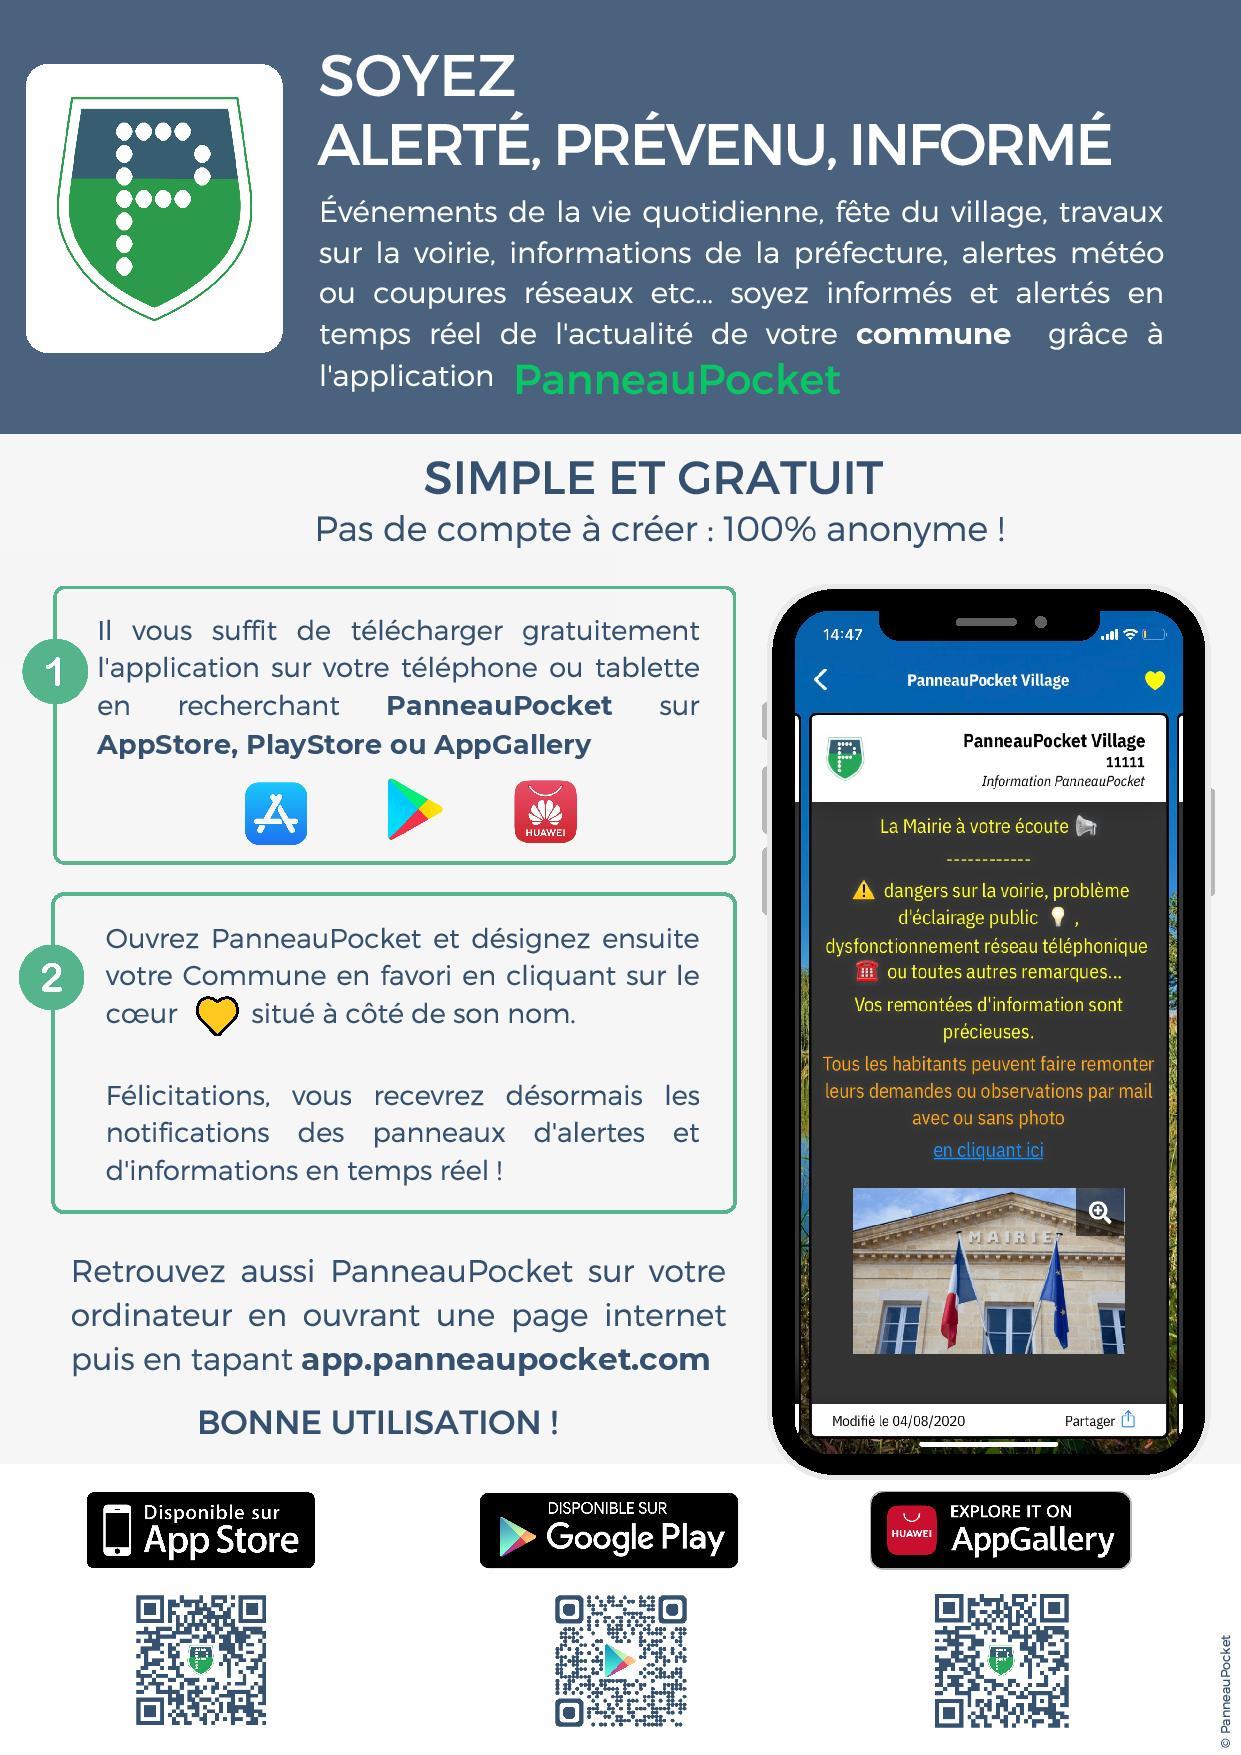 https://www.villers-les-luxeuil.com/projets/villers/files/images/2021_Mairie/PanneauPocket/Visuel_mairie_2.jpg